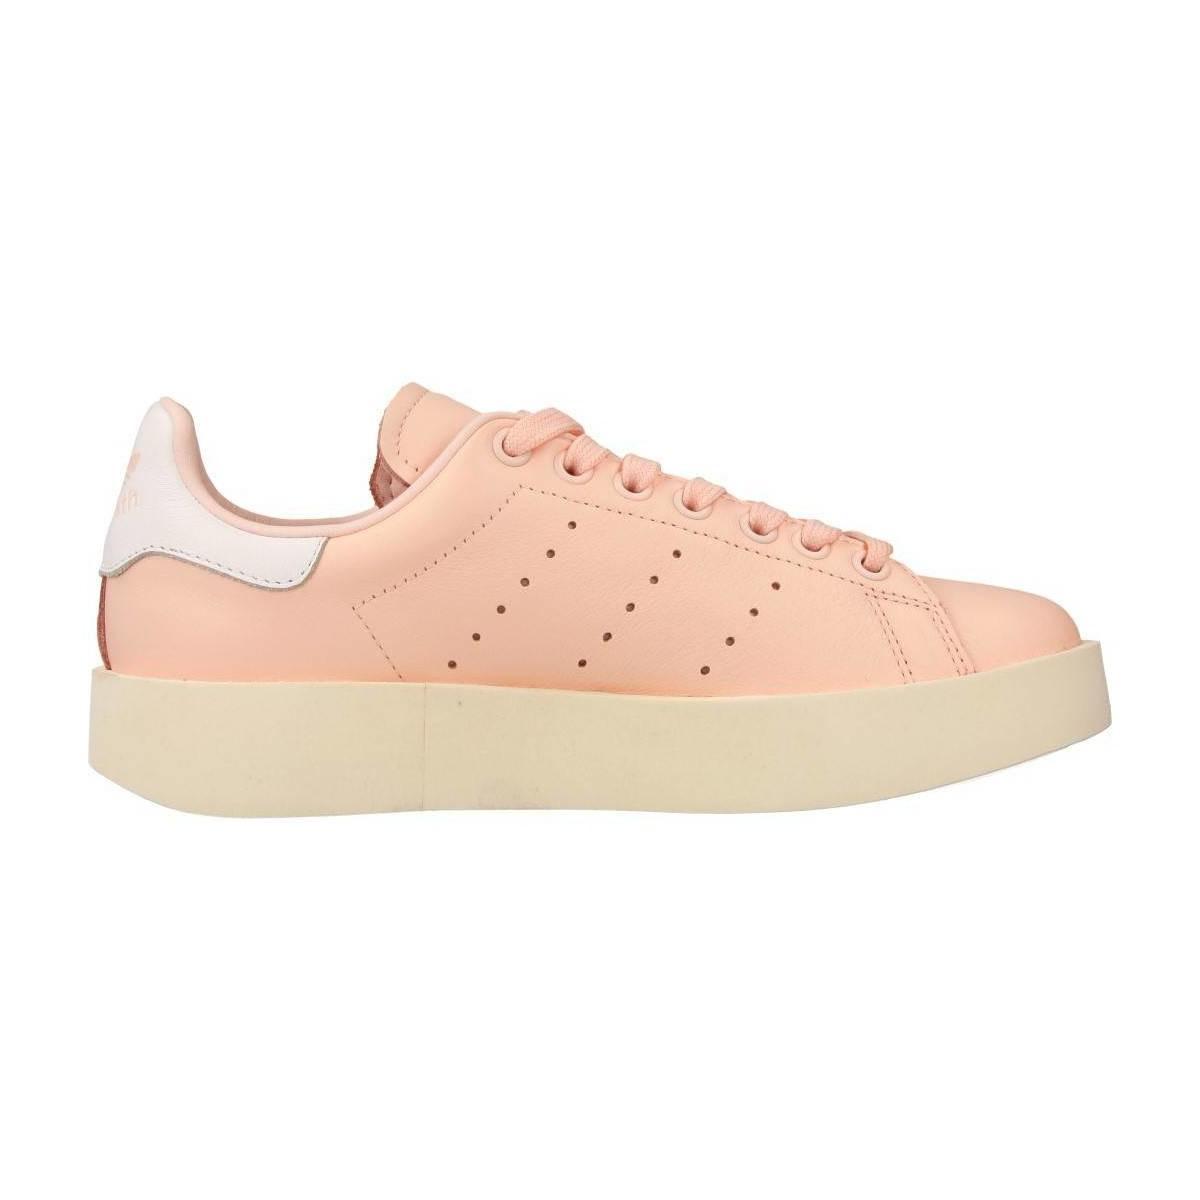 7ea49e253a7 Lyst - STAN SMITH BOLD femmes Chaussures en rose adidas en coloris Rose